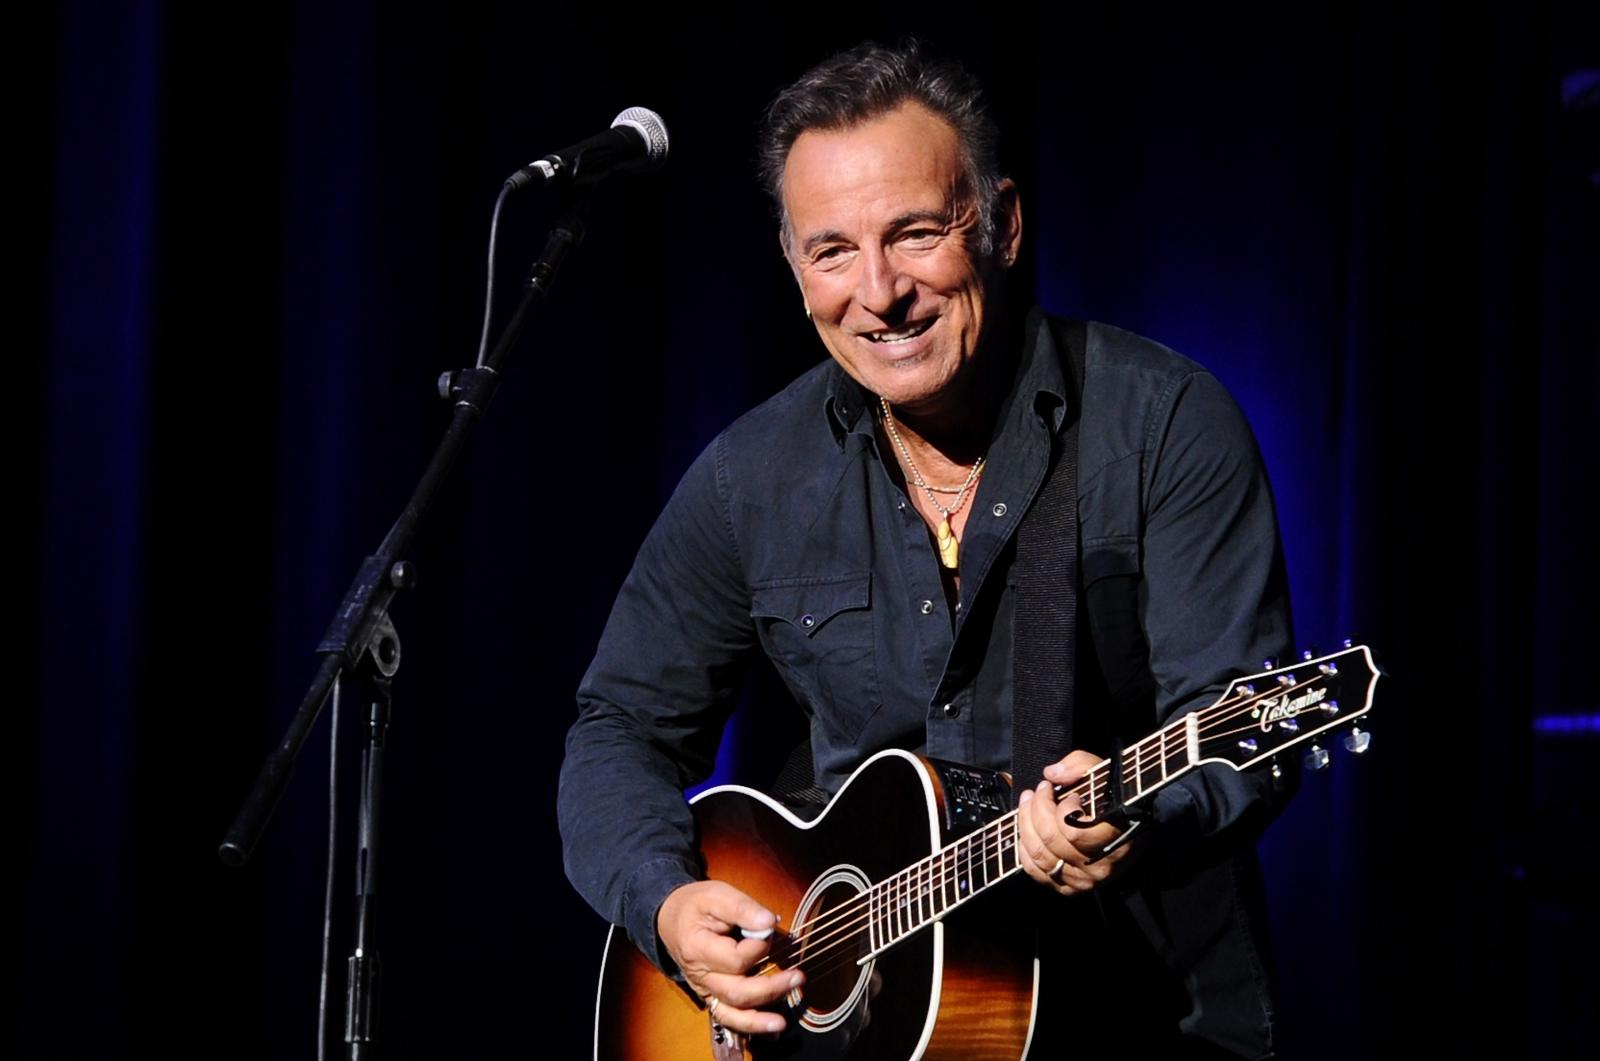 Colin Kaepernick protest: Bruce Springsteen admire's NFL ... Bruce Springsteen